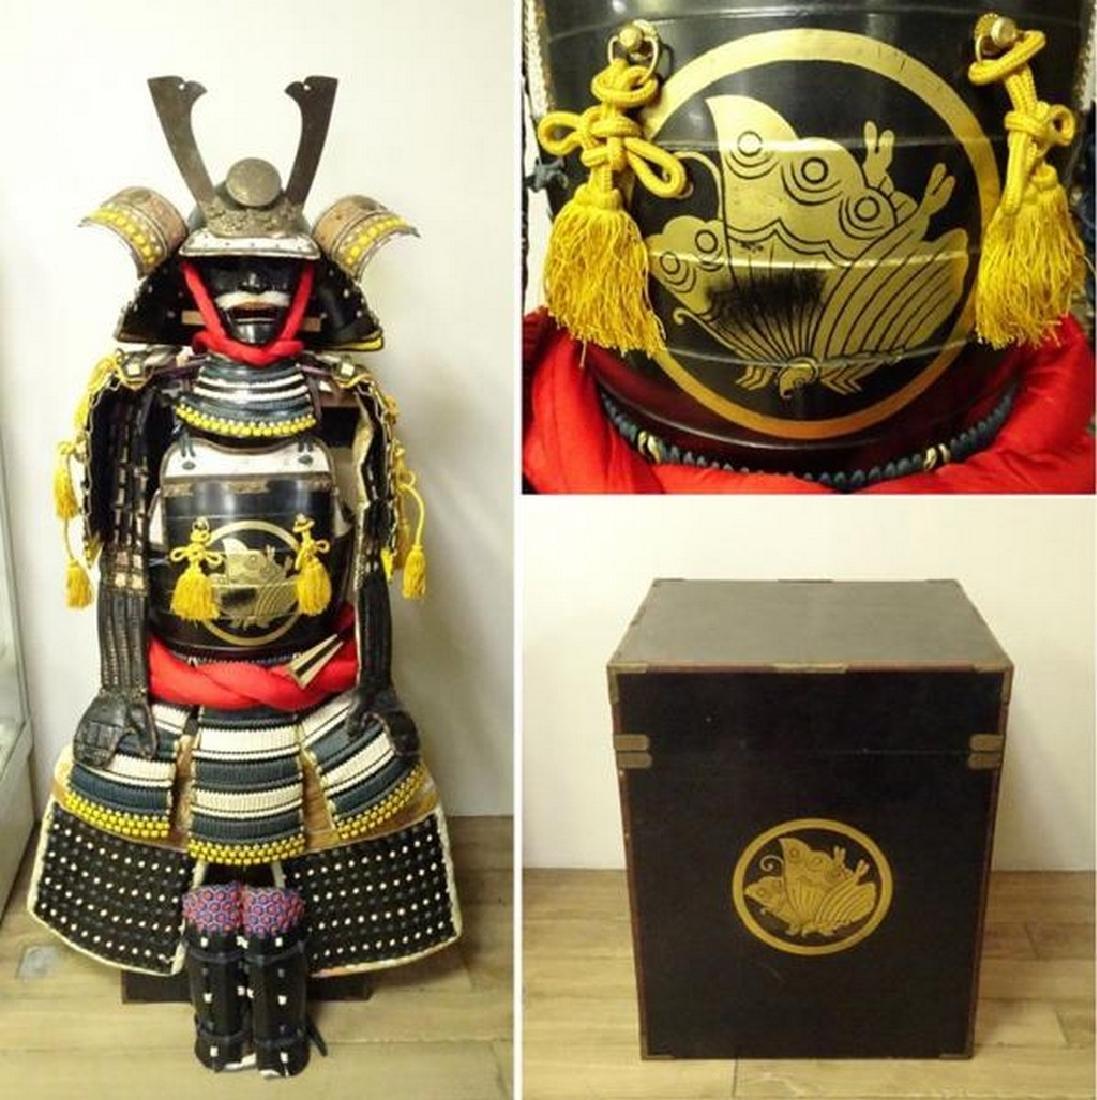 Original Japanese Samurai armor from the Showa period